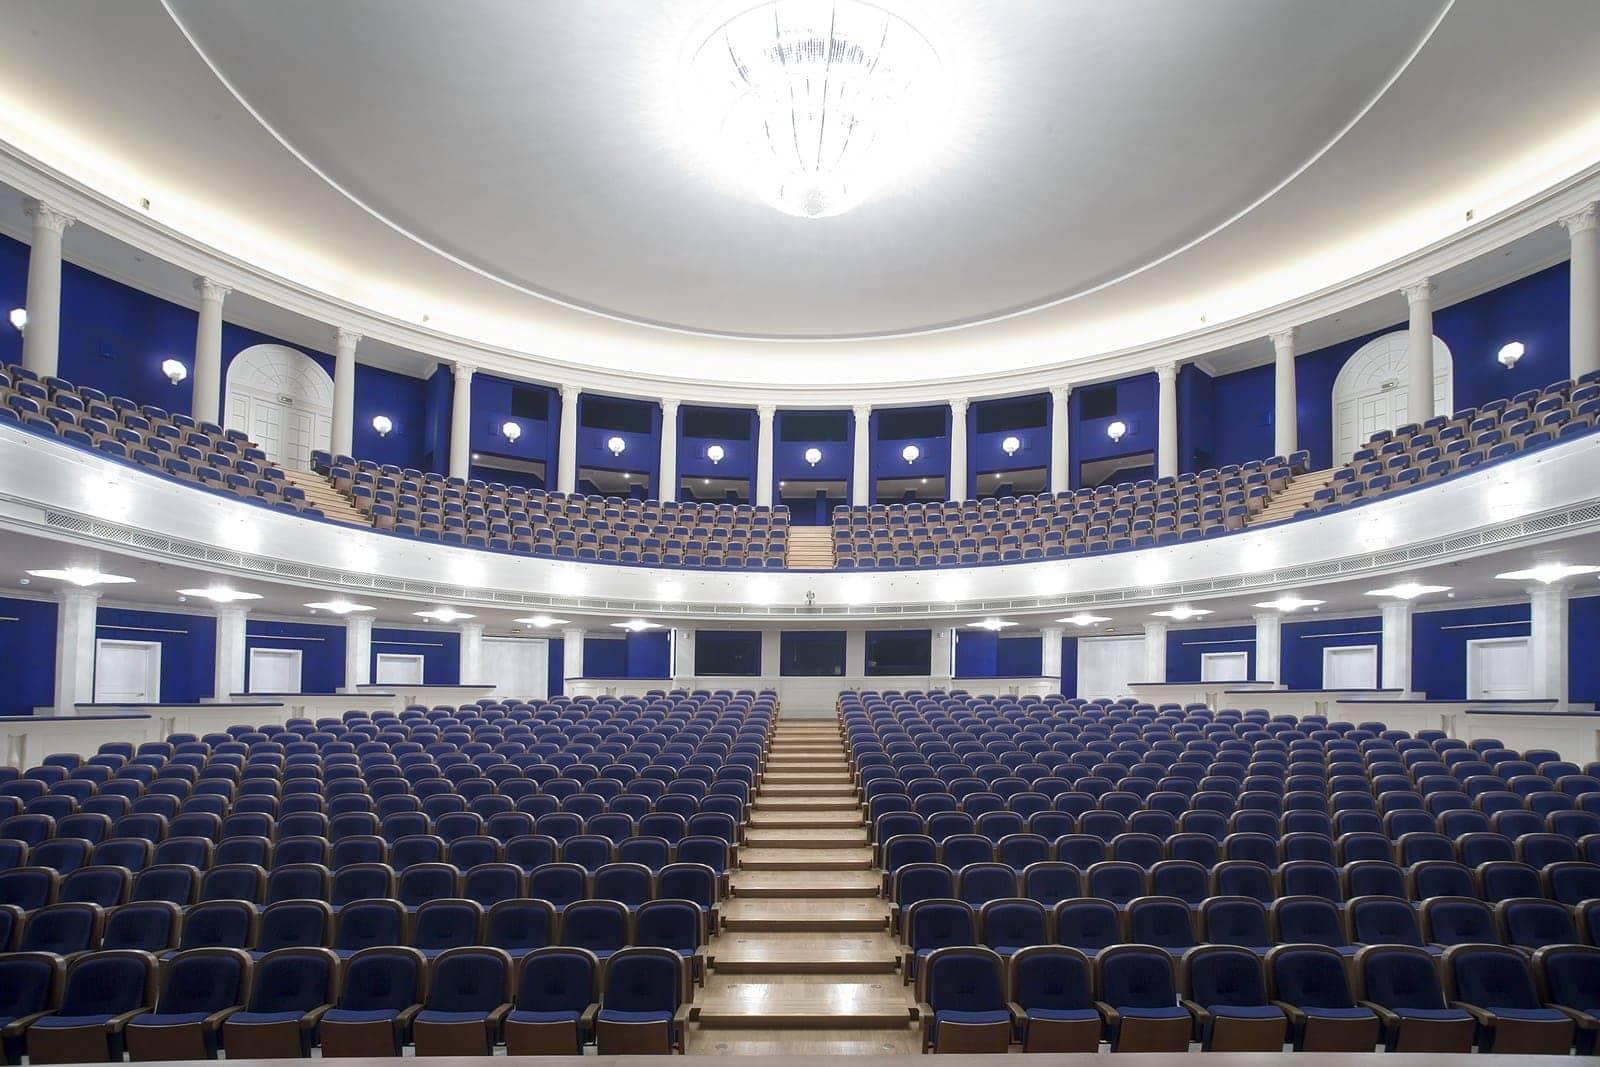 Театр имени немировича данченко